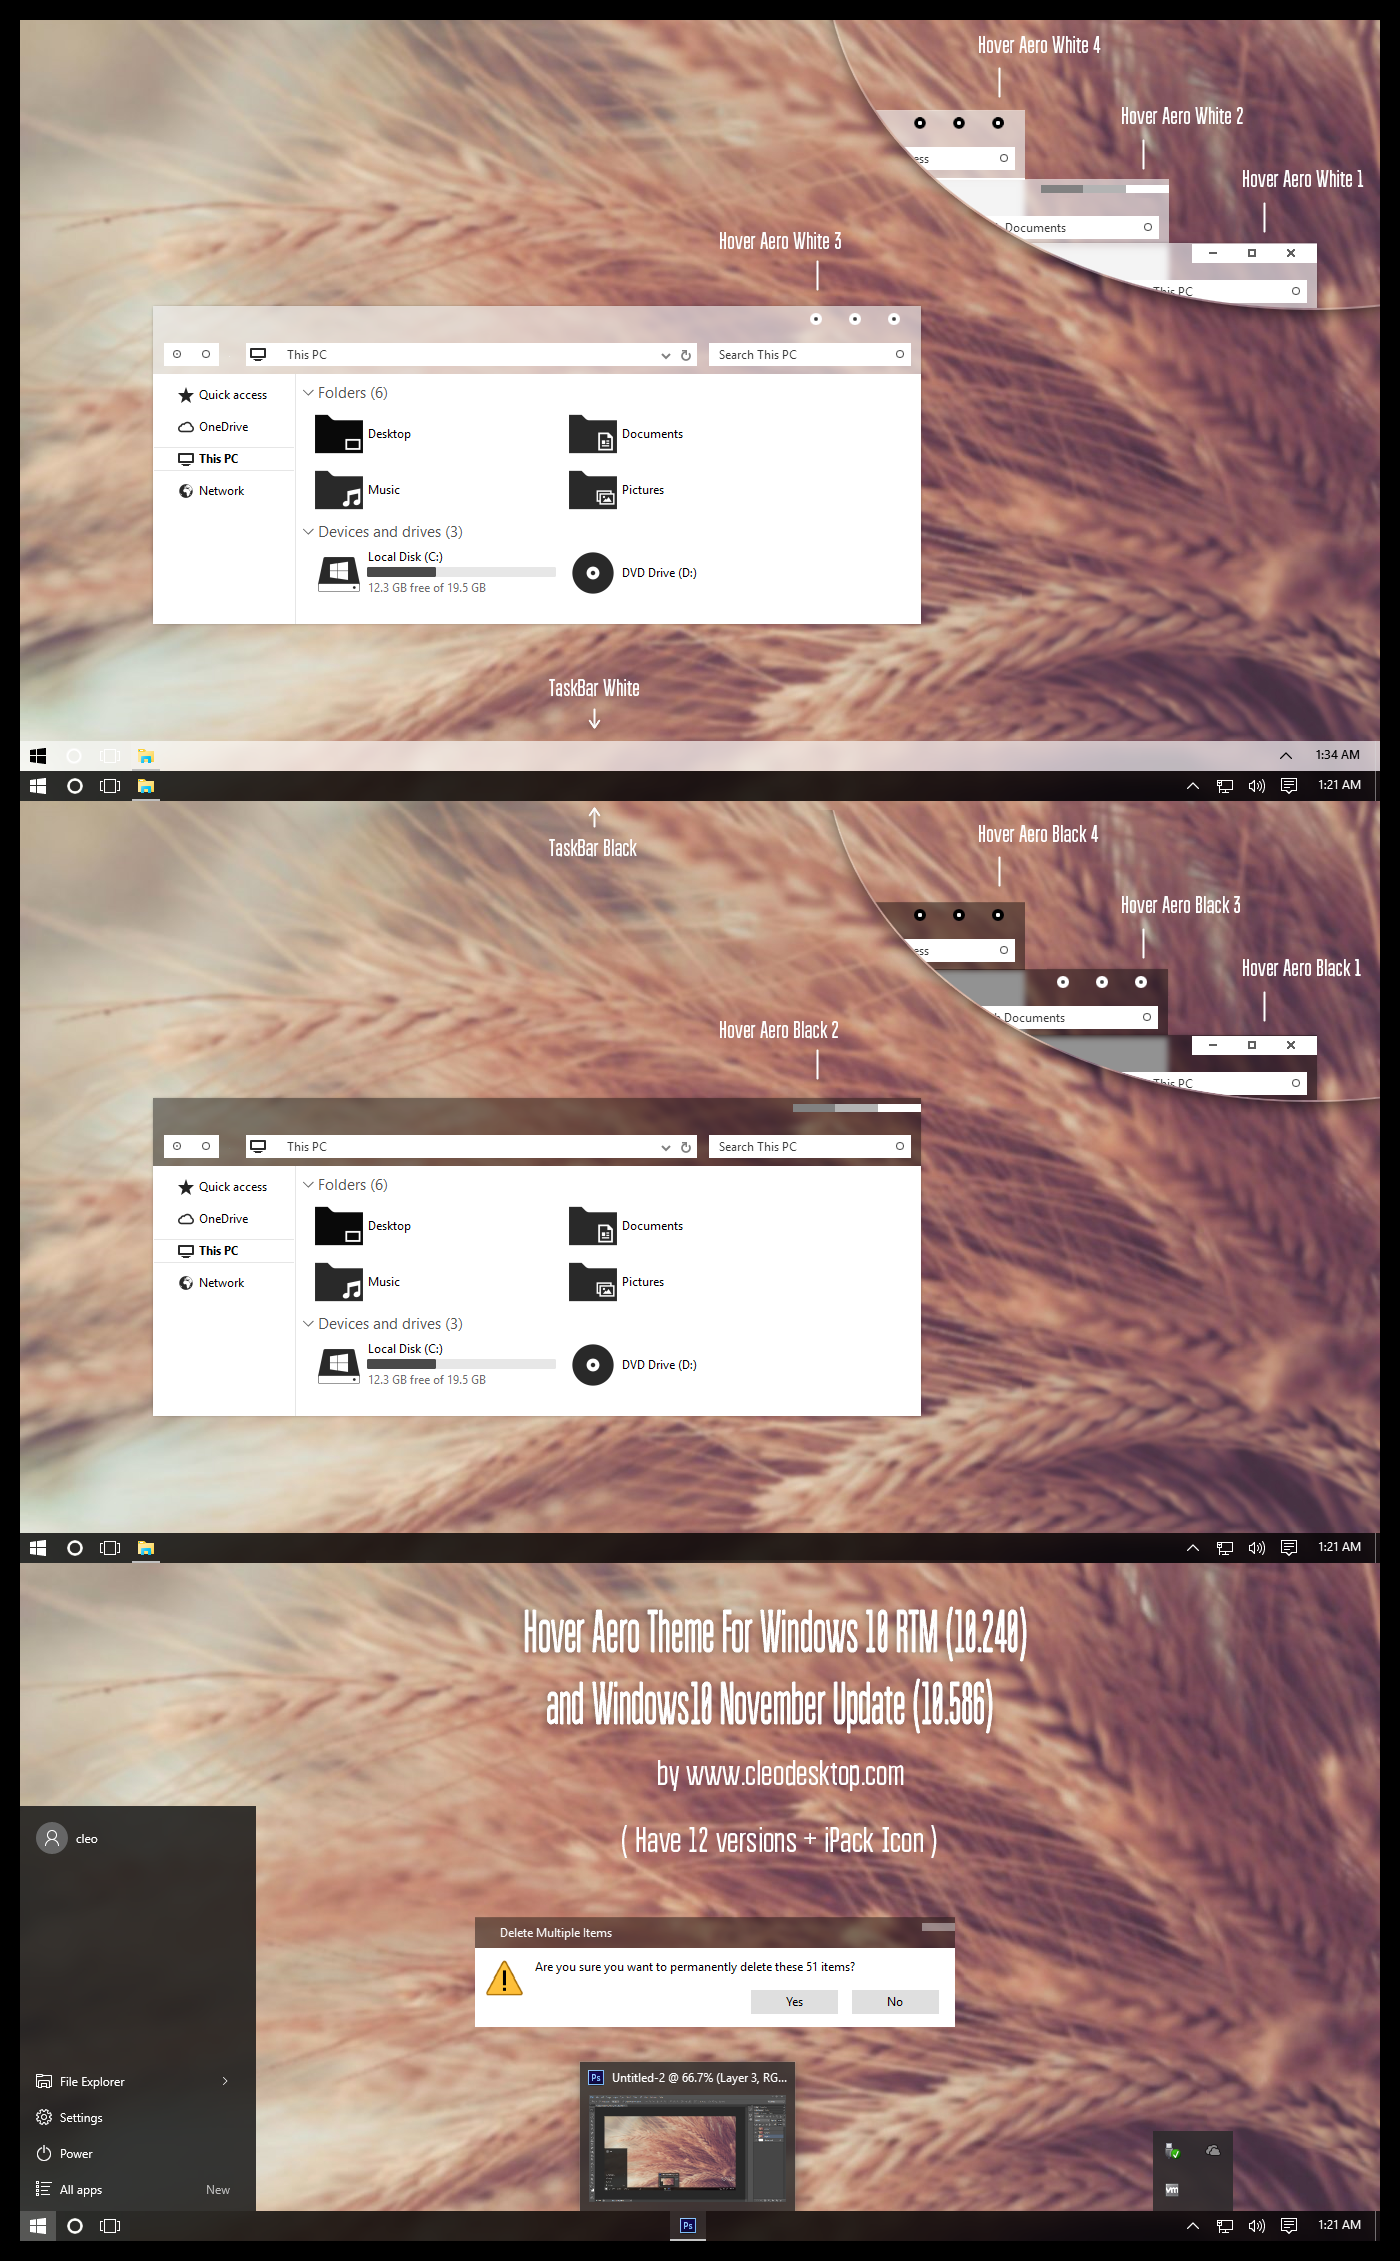 Hover Aero Theme Windows 10 RTM (November Update) by Cleodesktop